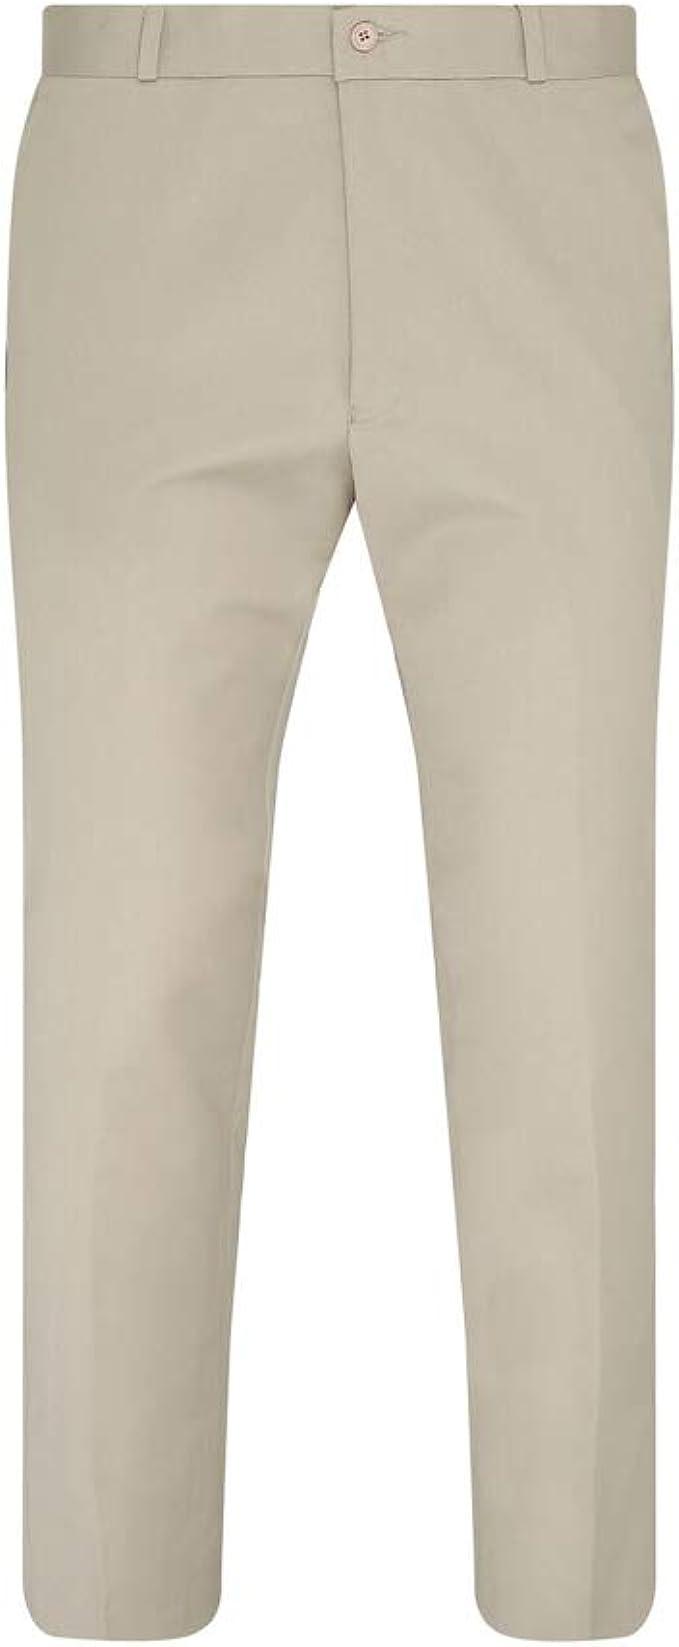 1960s Men's Clothing Relco Mens Sta-Press Mod Trousers £34.99 AT vintagedancer.com